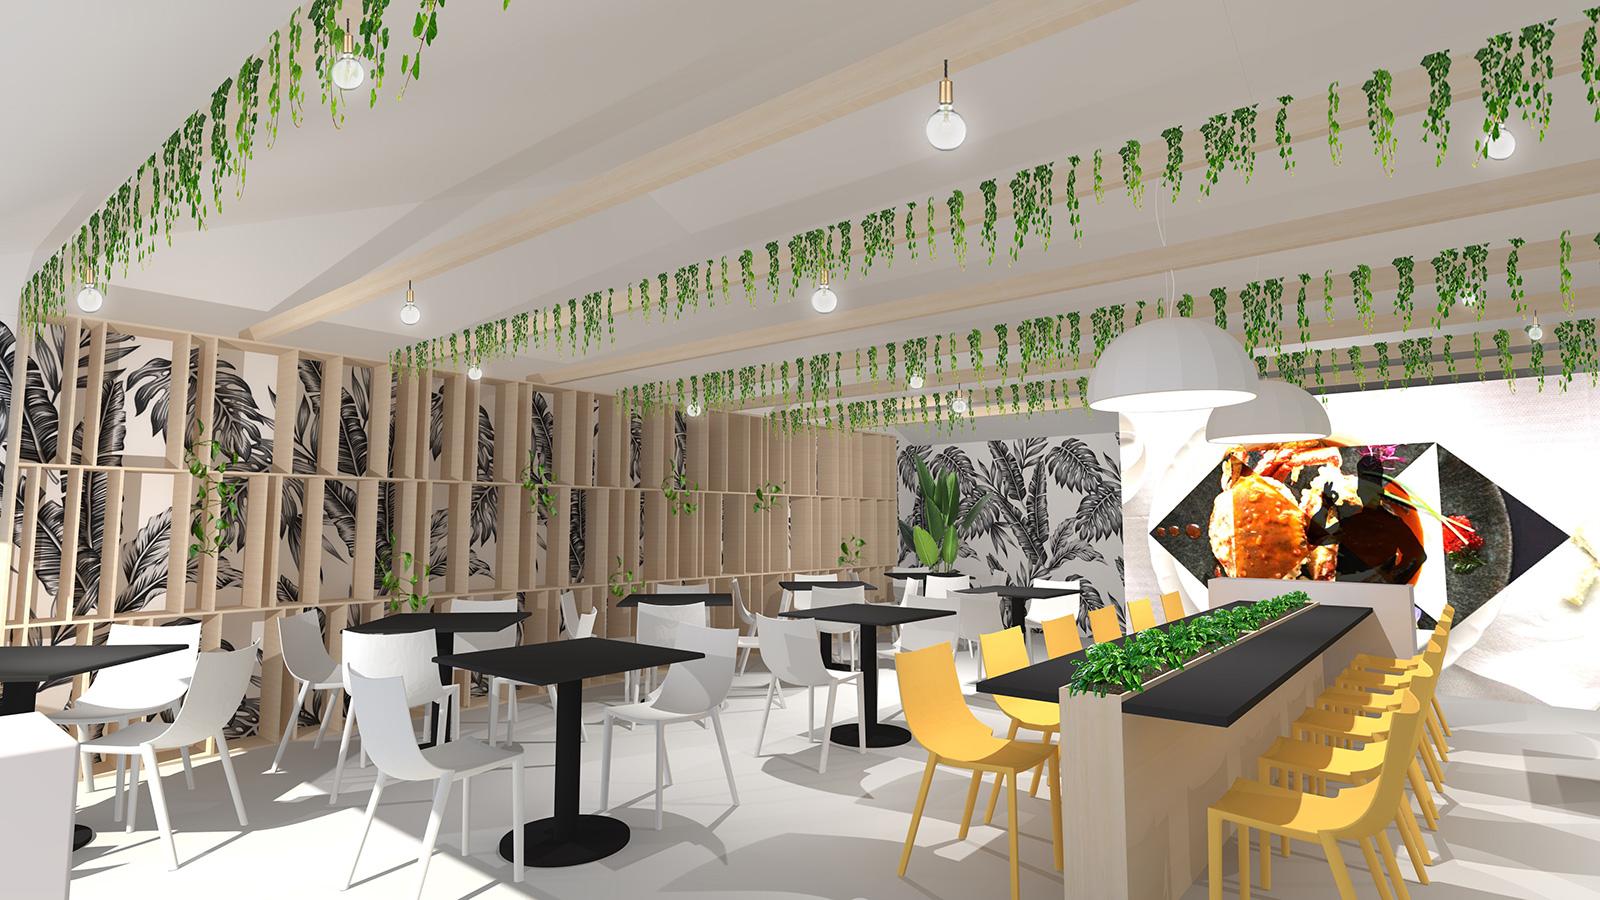 HSBC_Dining-area